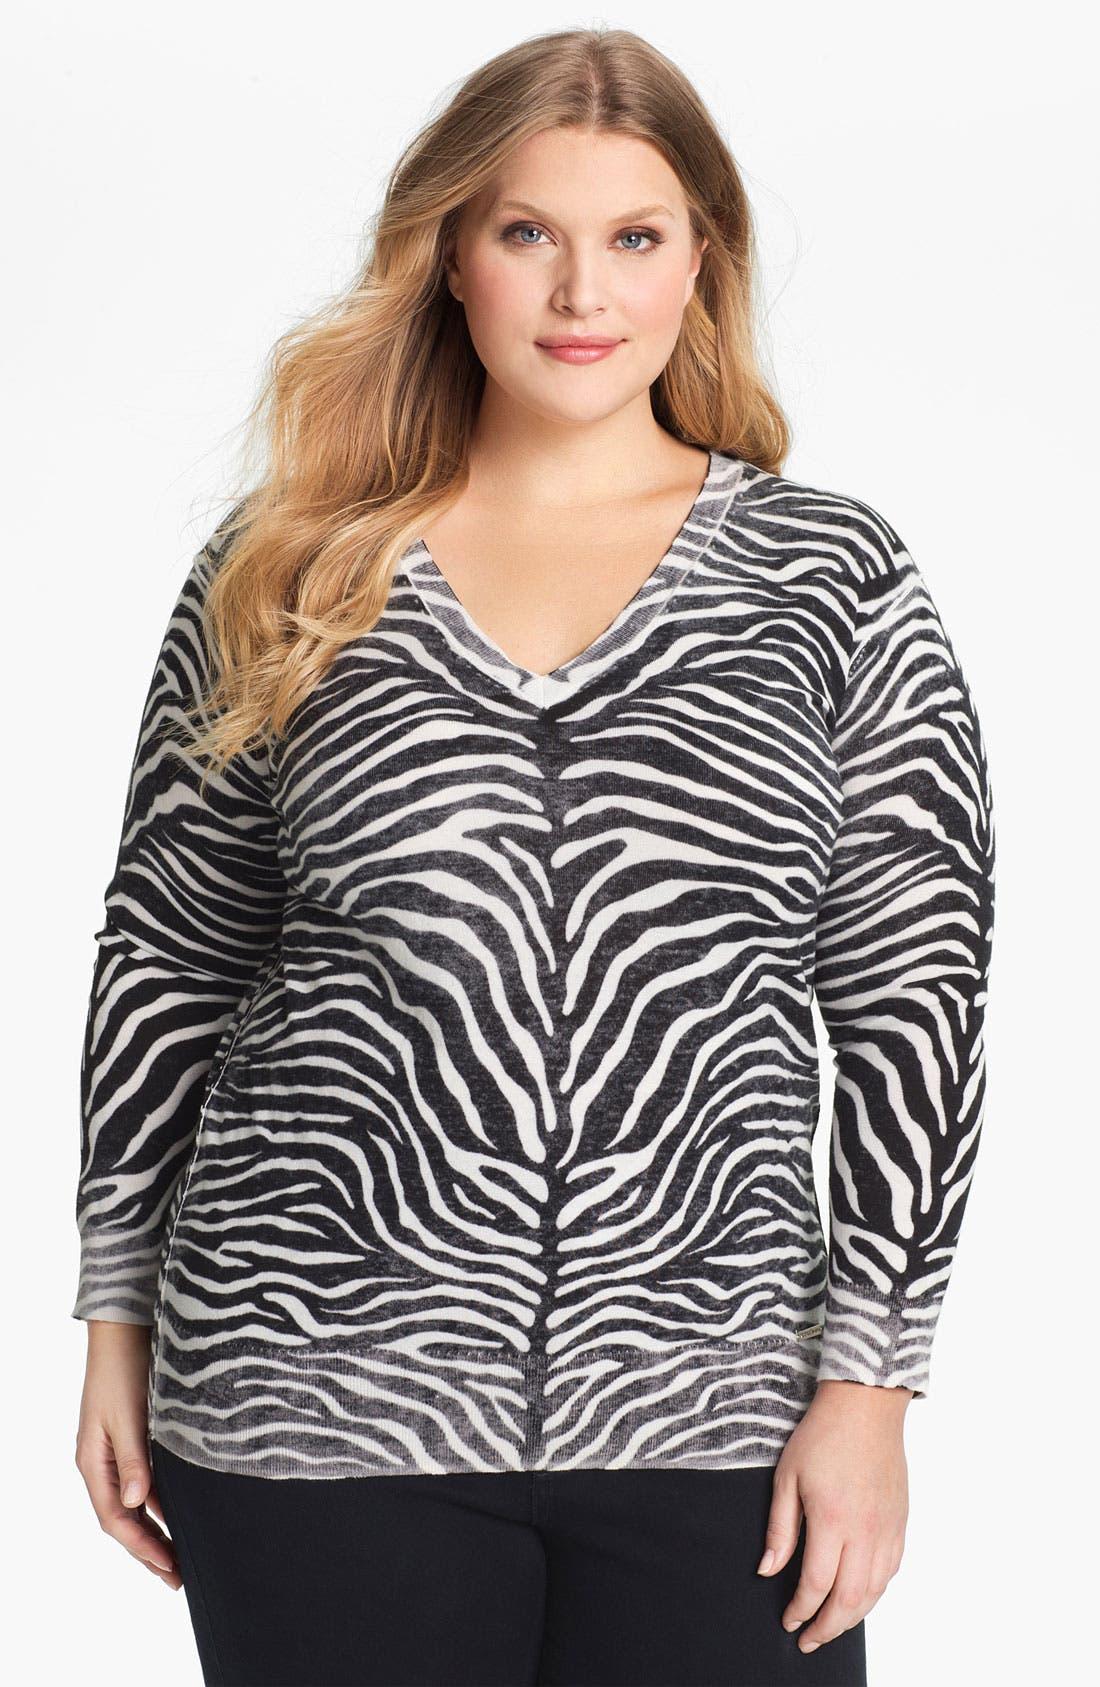 Alternate Image 1 Selected - MICHAEL Michael Kors Print V-Neck Sweater (Plus)